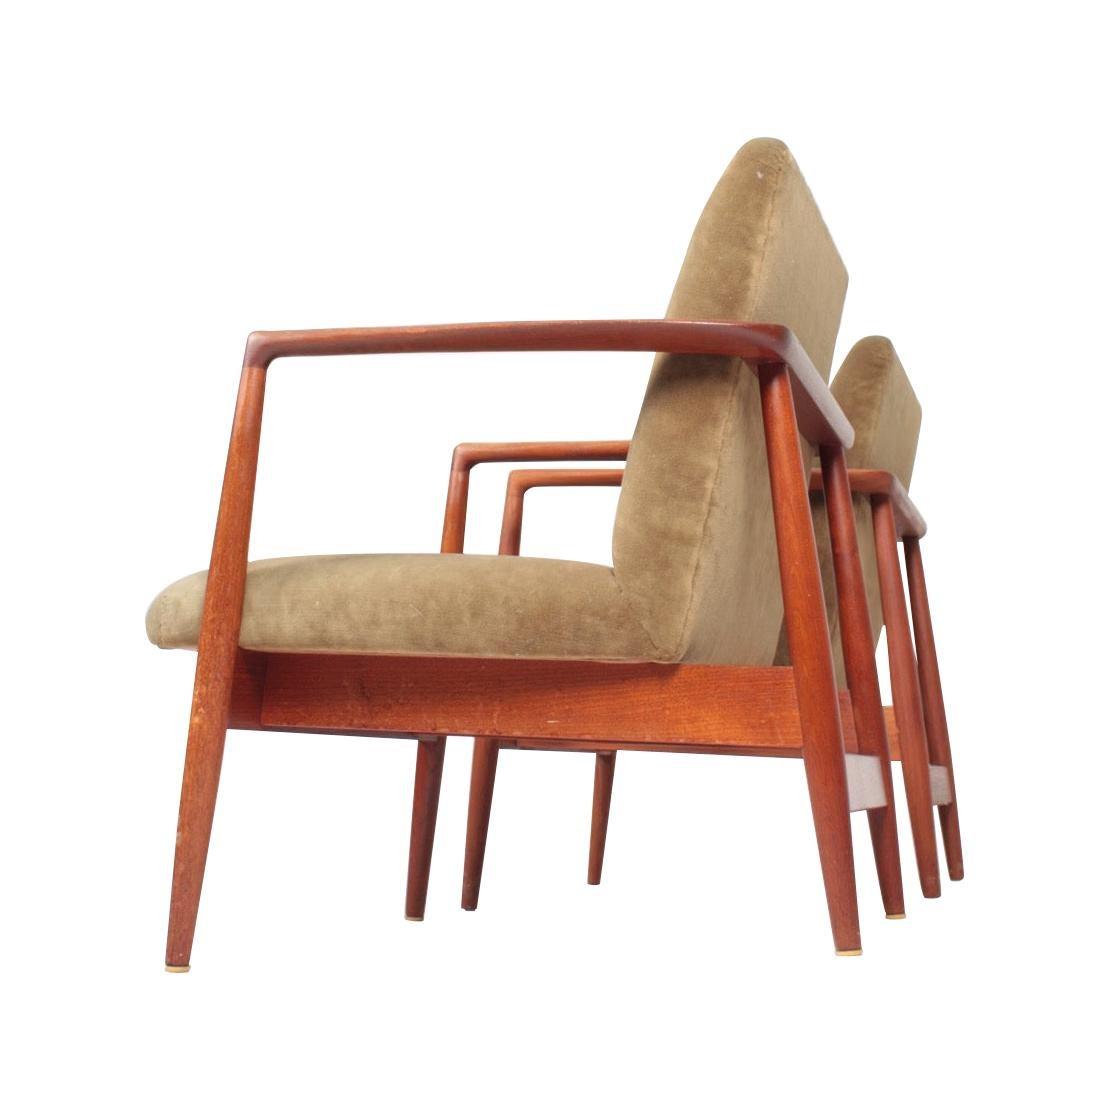 Pair of Midcentury Lounge Chairs in Teak and Velvet by C.B Hansen, 1950s